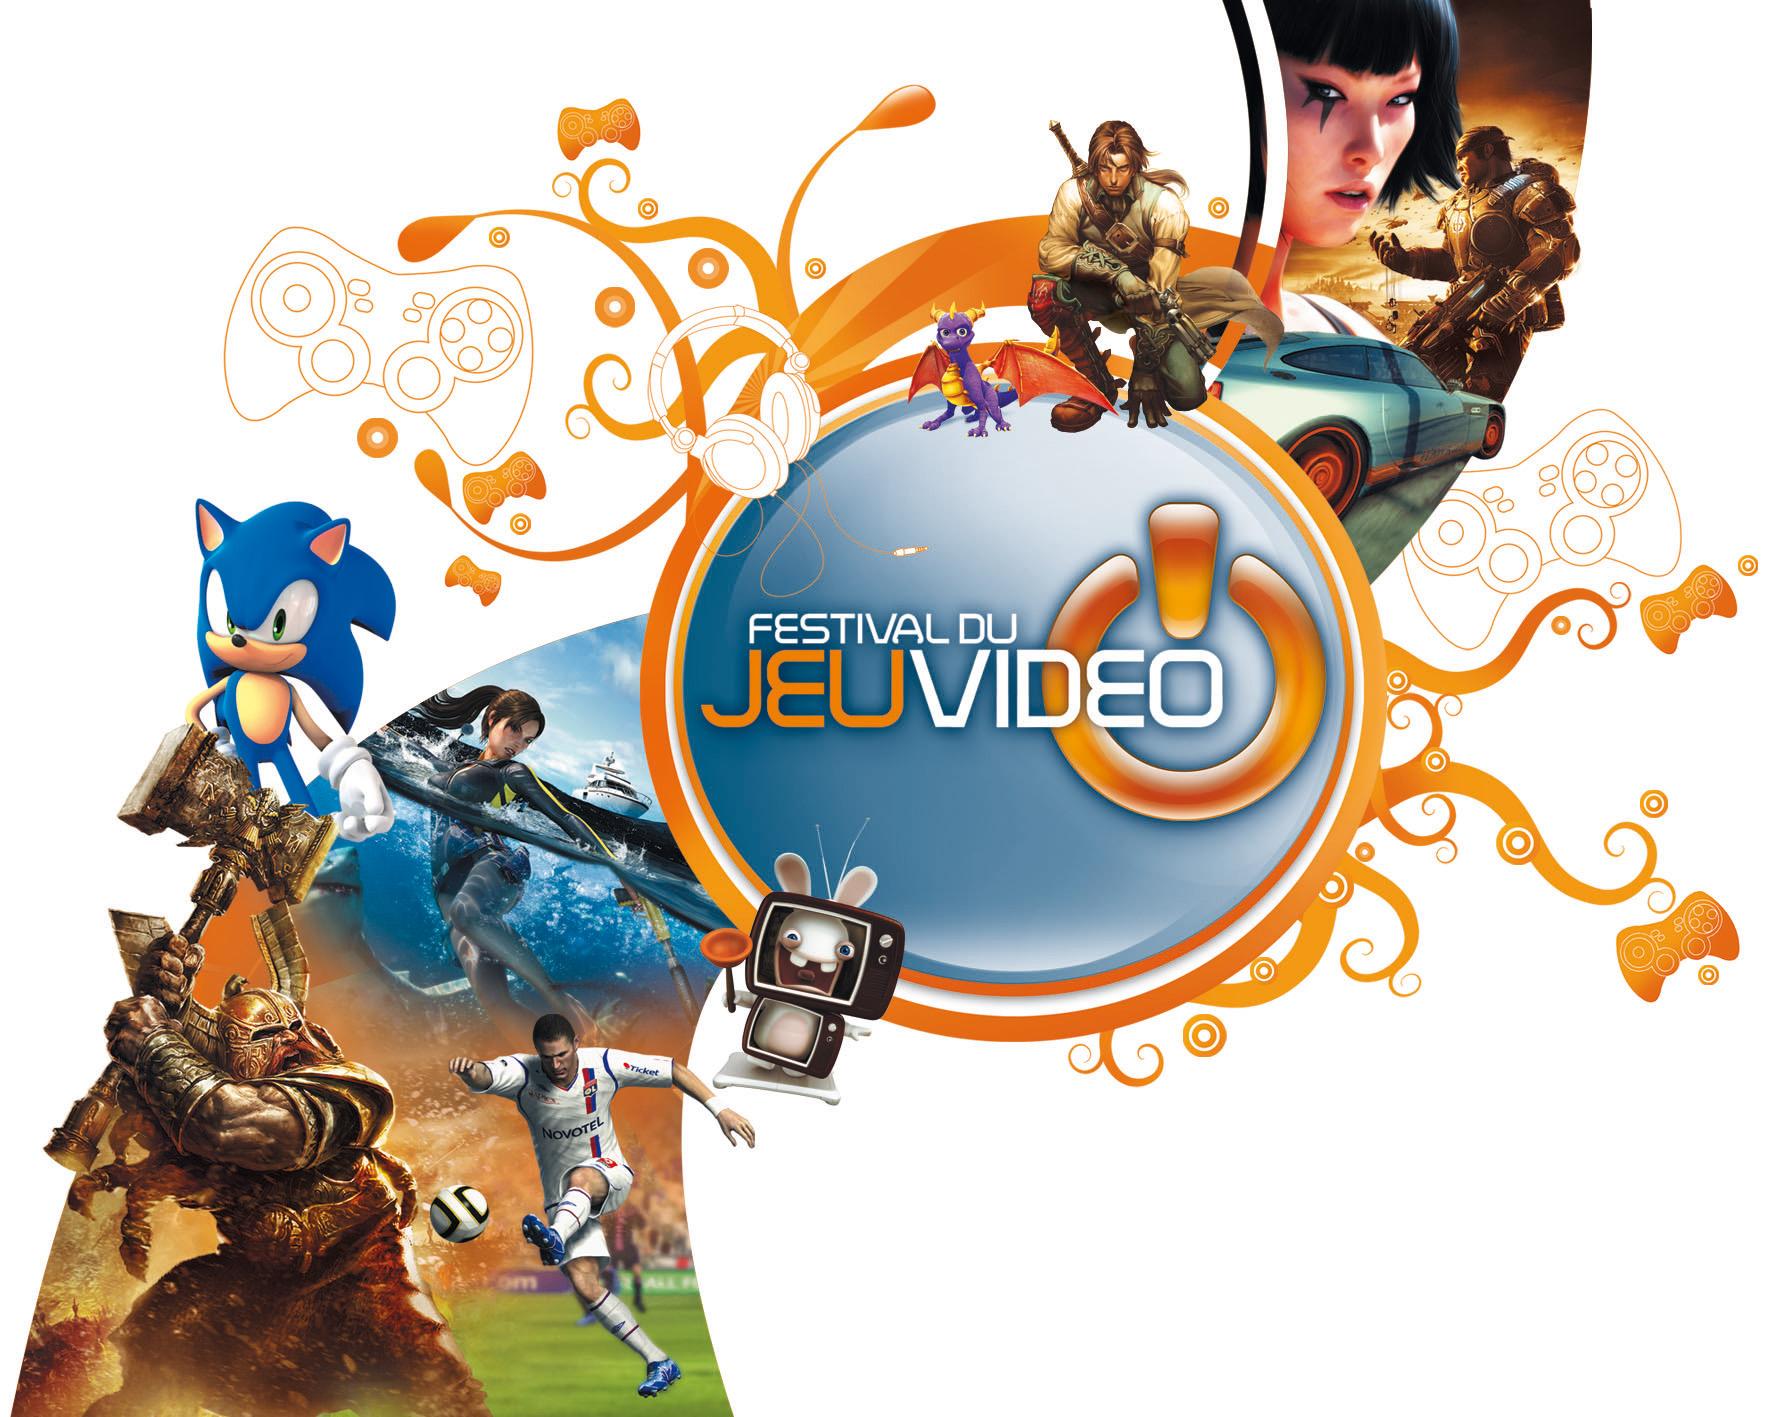 festival-du-jeu-video-2008